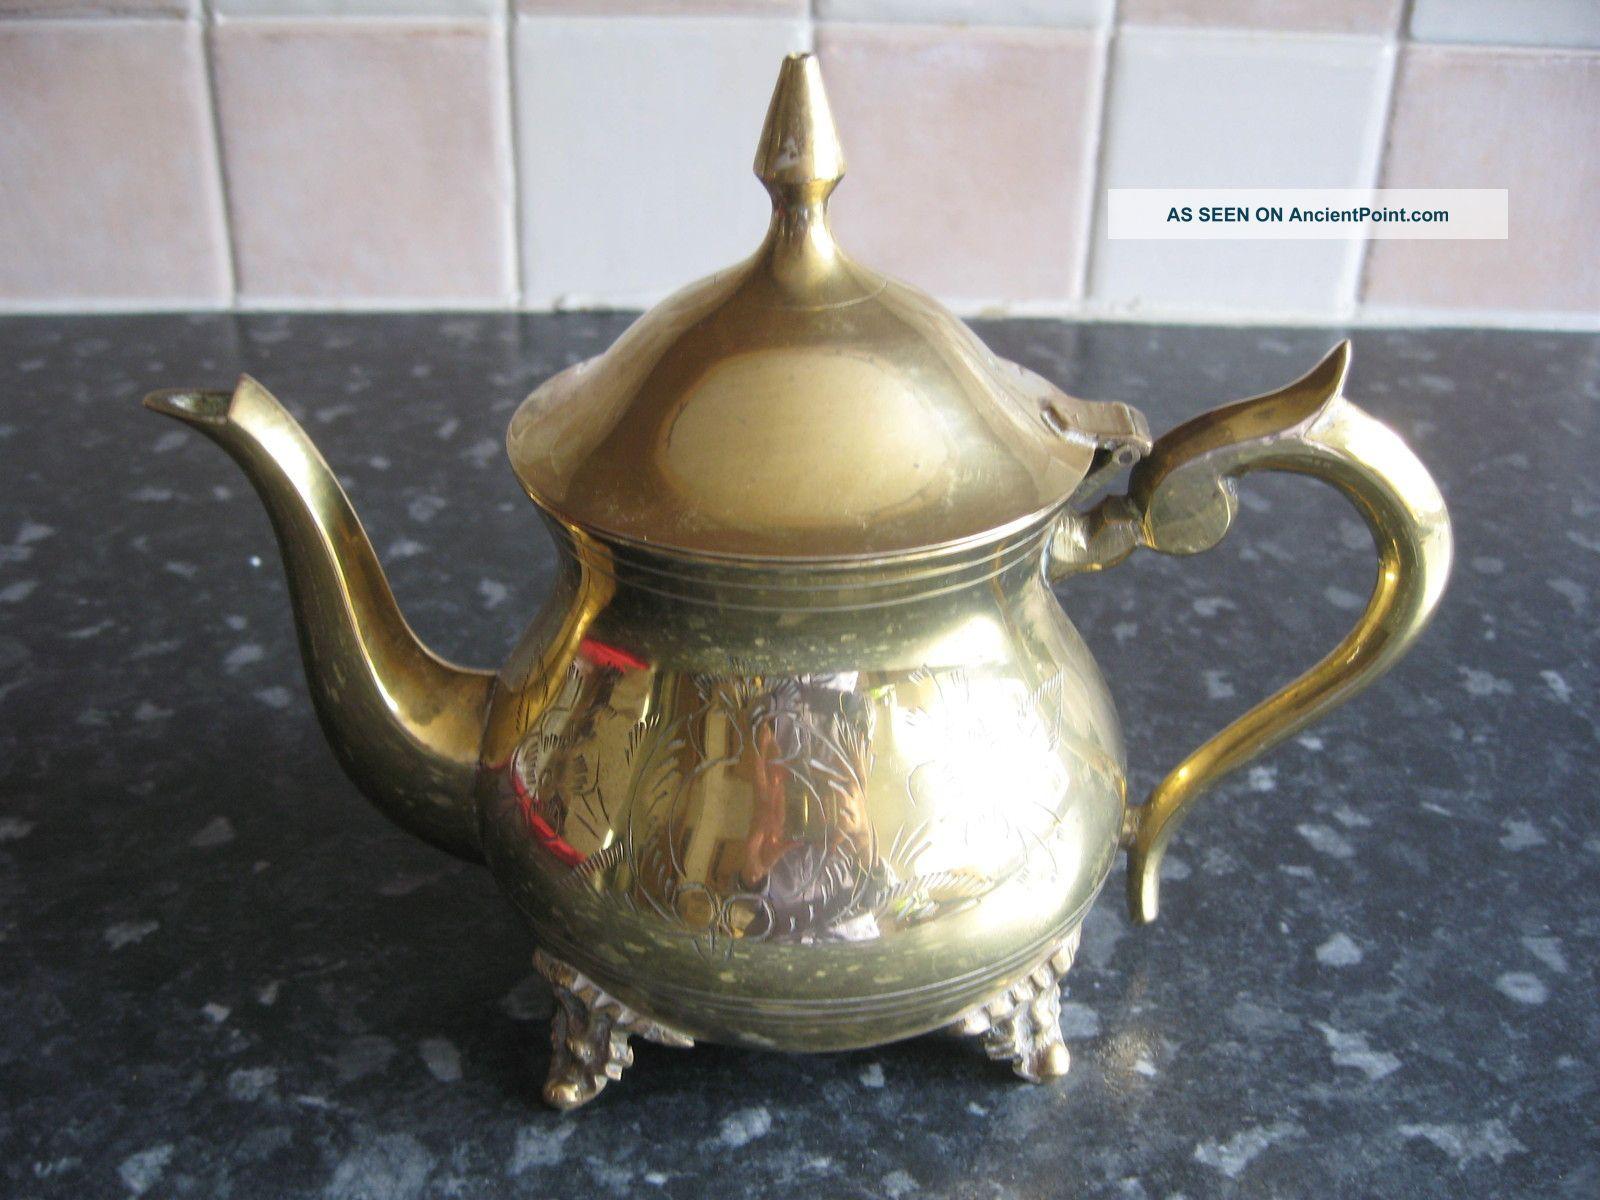 Stylish Silver Plated Tea Pot Tea/Coffee Pots & Sets photo